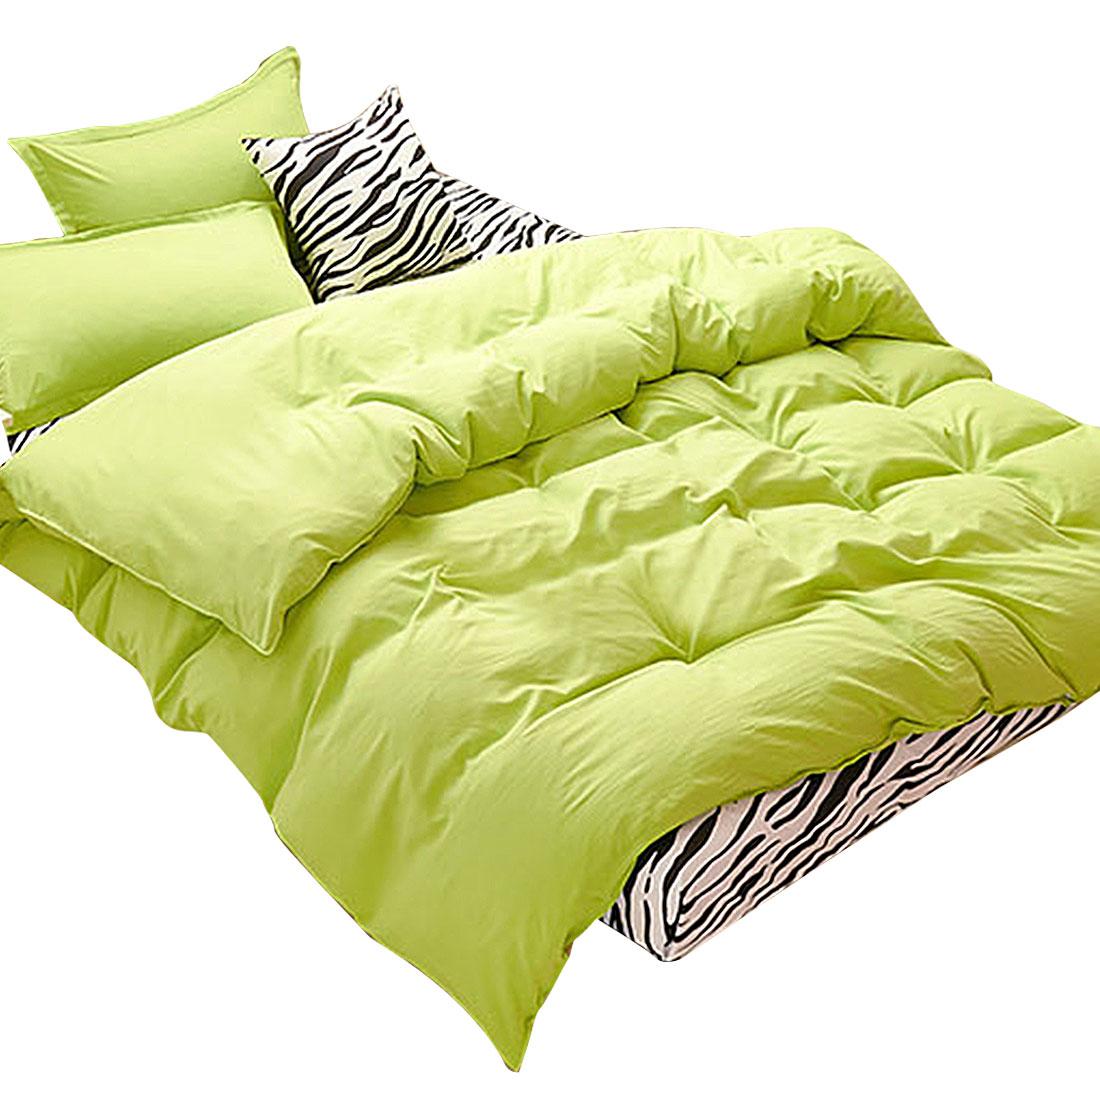 Bedroom Duvet Quilt Cover Pillowcase Bedding Set Bedclothes Green Double Size